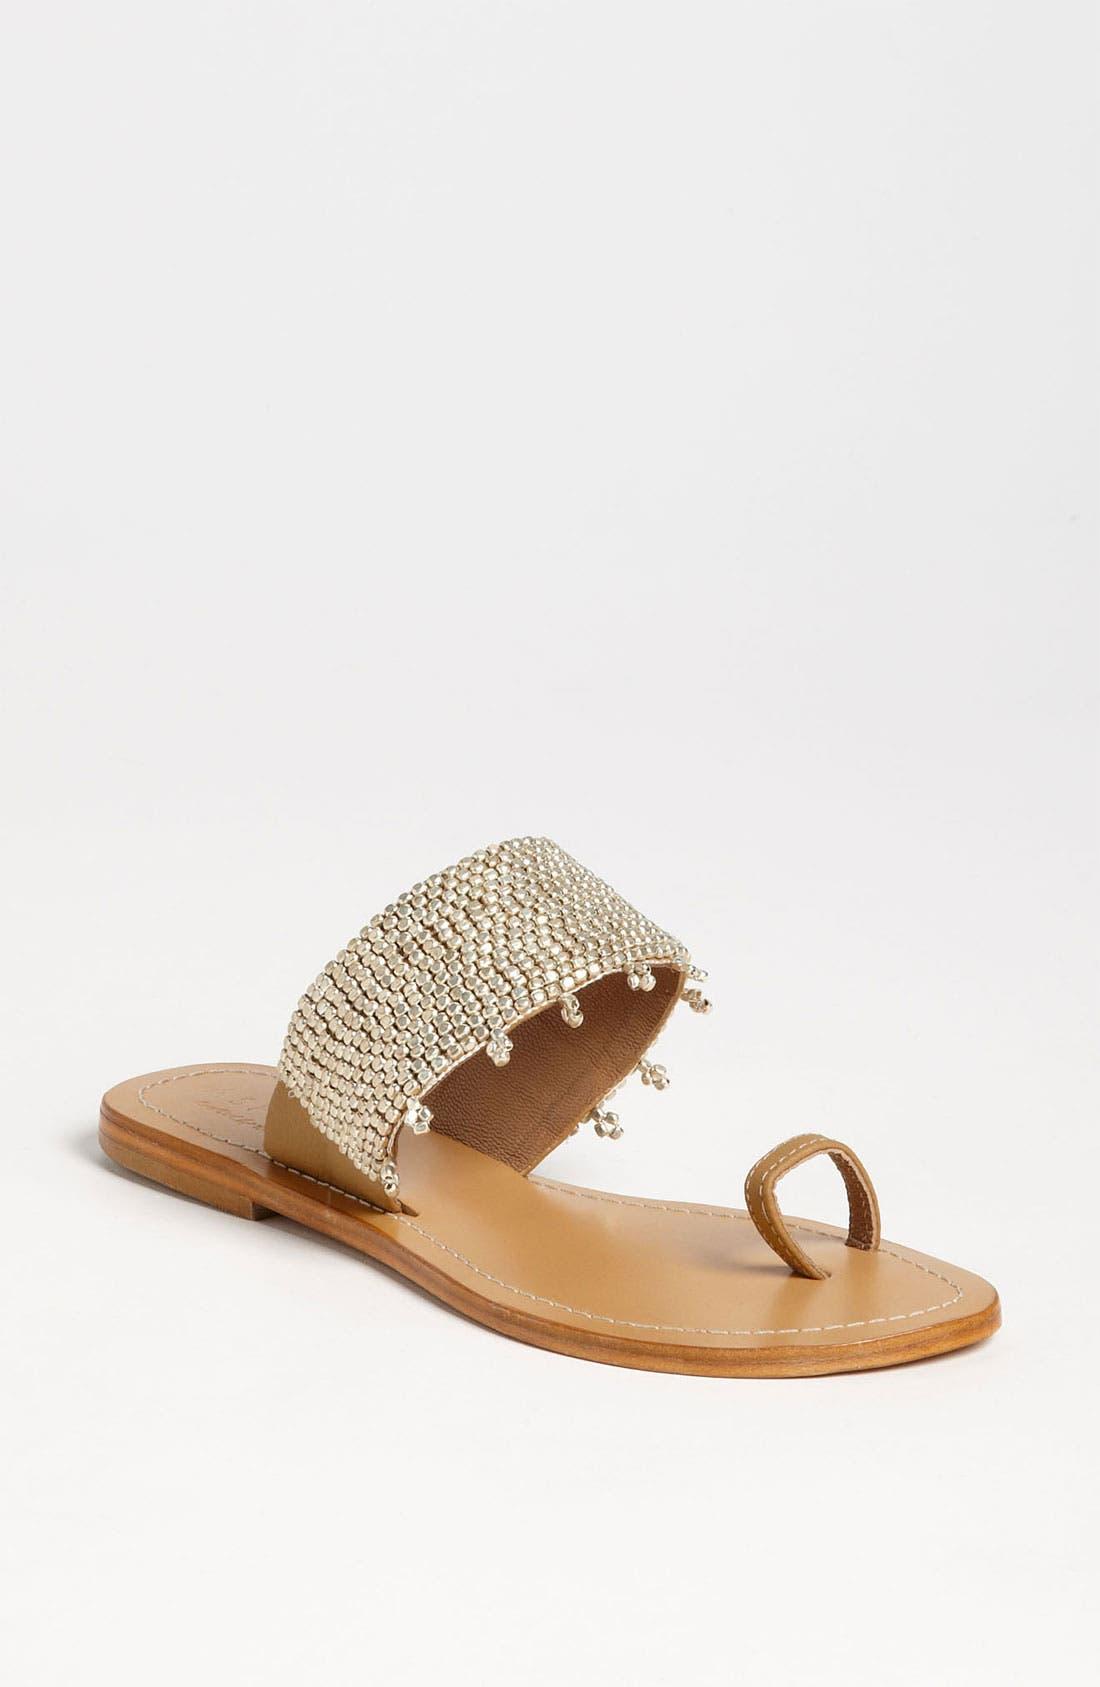 Main Image - Aspiga 'Luna' Sandal